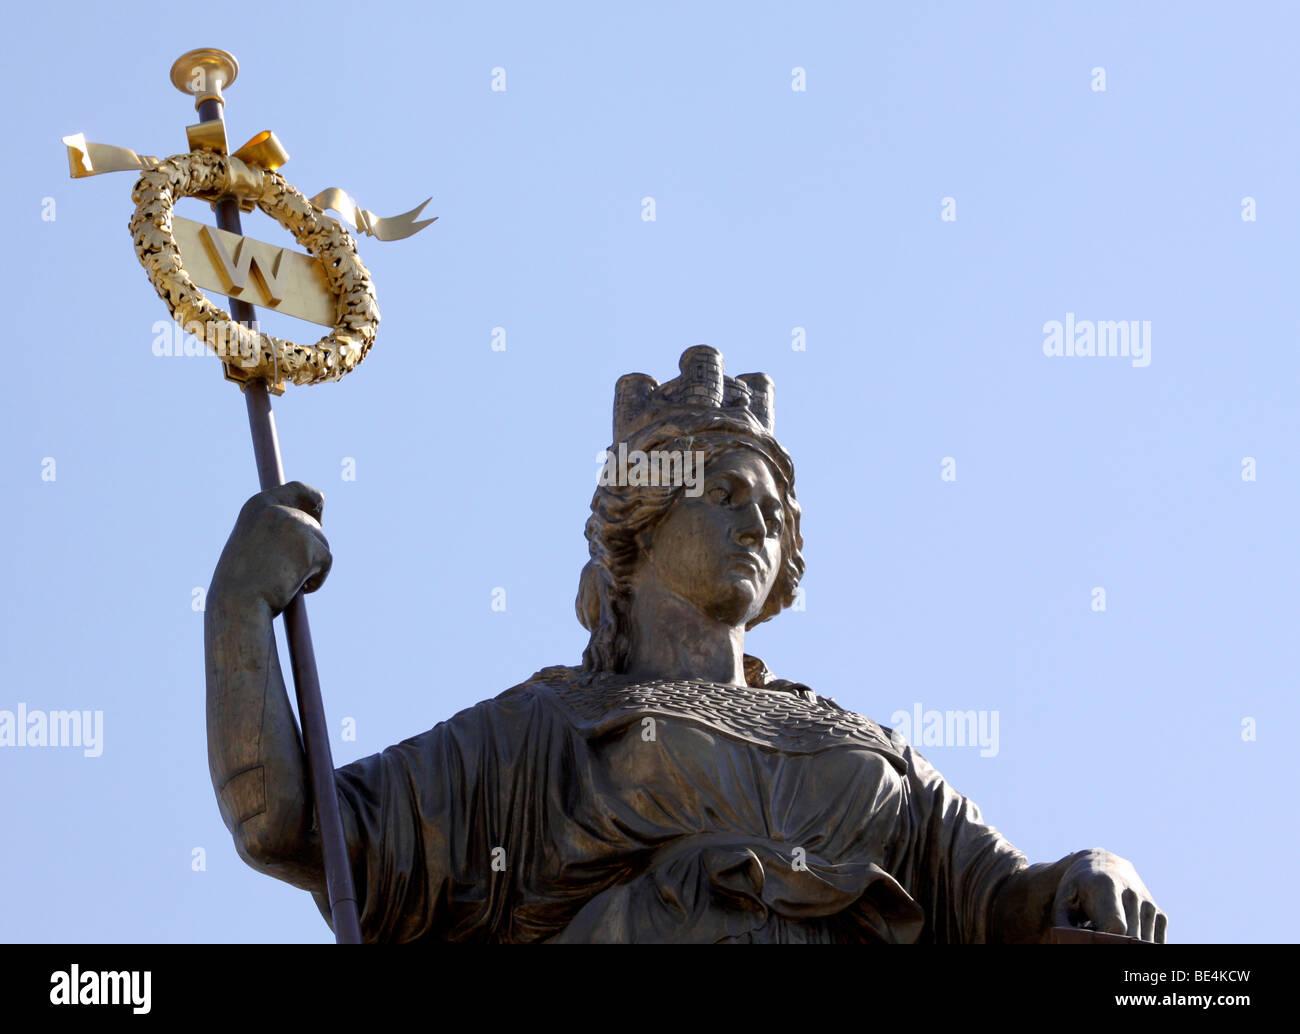 Brunonia statue on the castle arcades, Brunswick, Lower Saxony, Germany, Europe - Stock Image